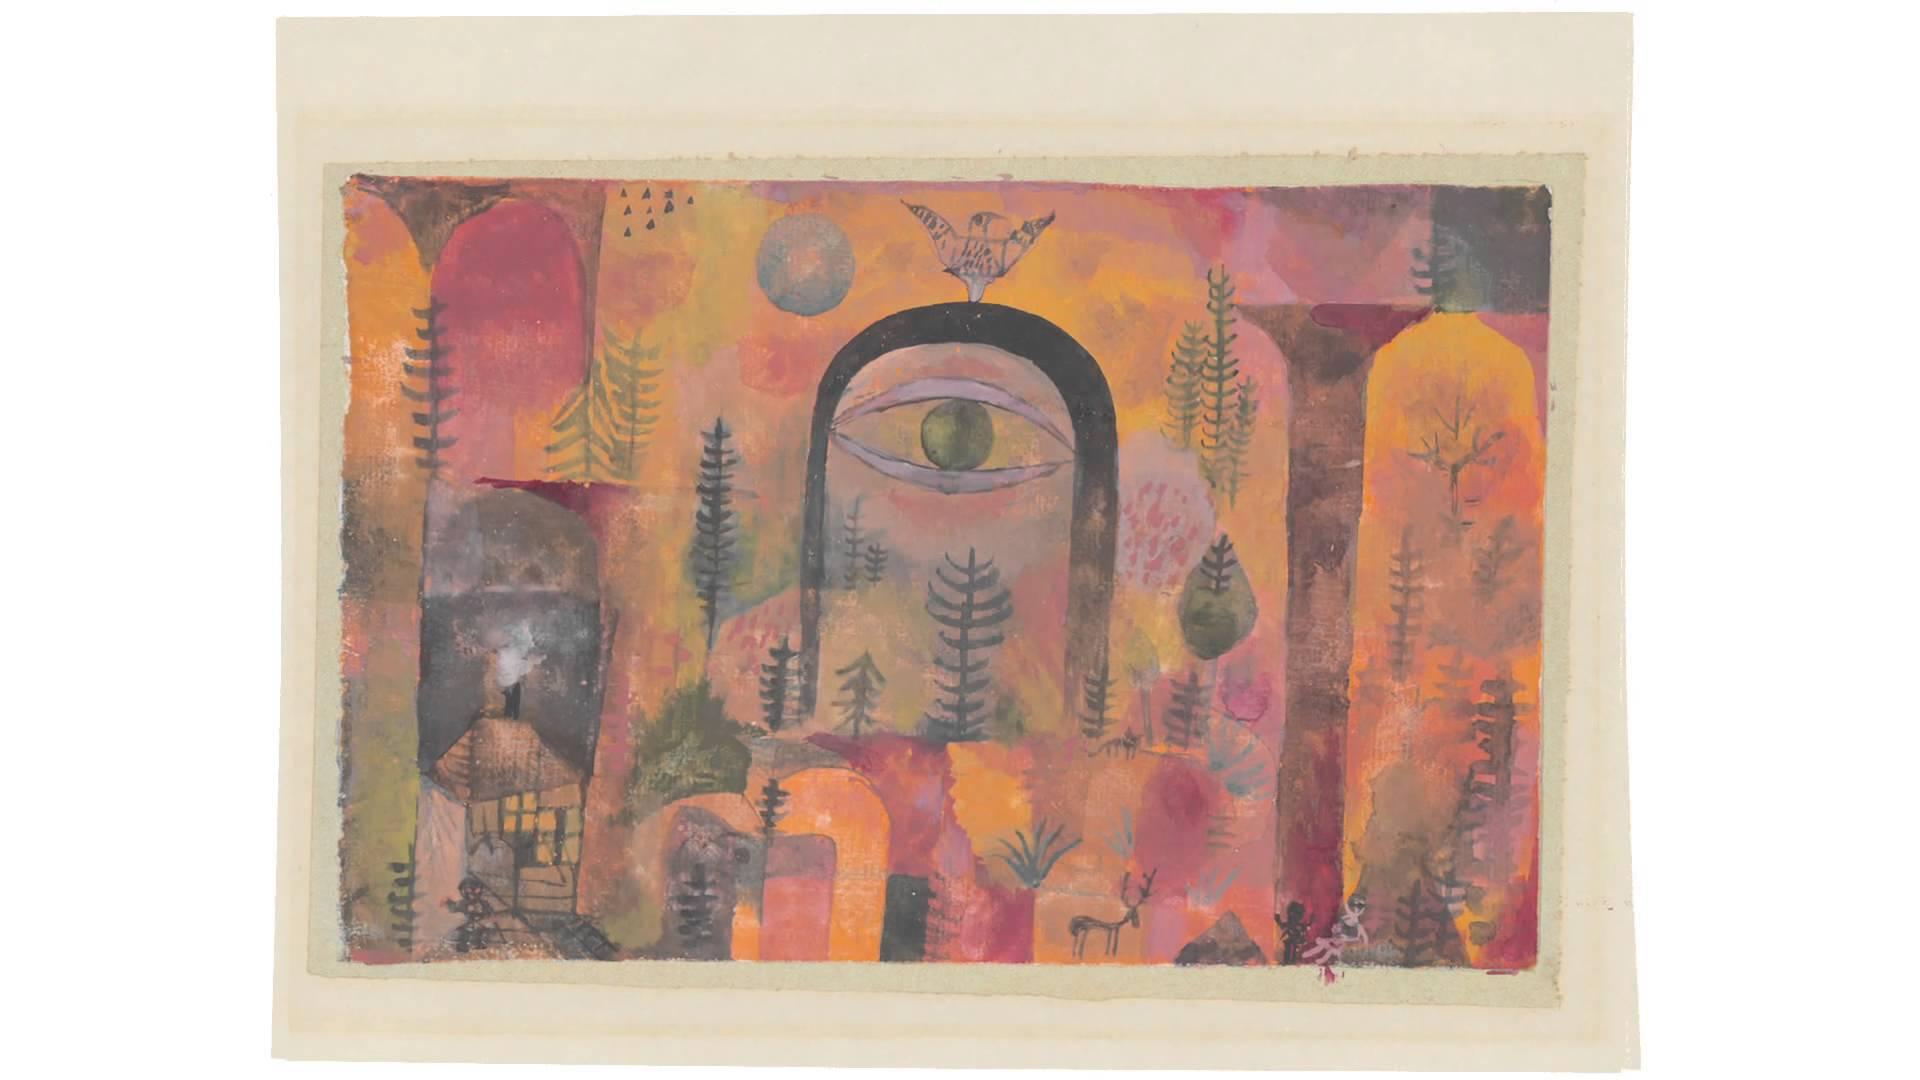 Zentrum Paul Klee  Paul Klee mit dem Adler 1918